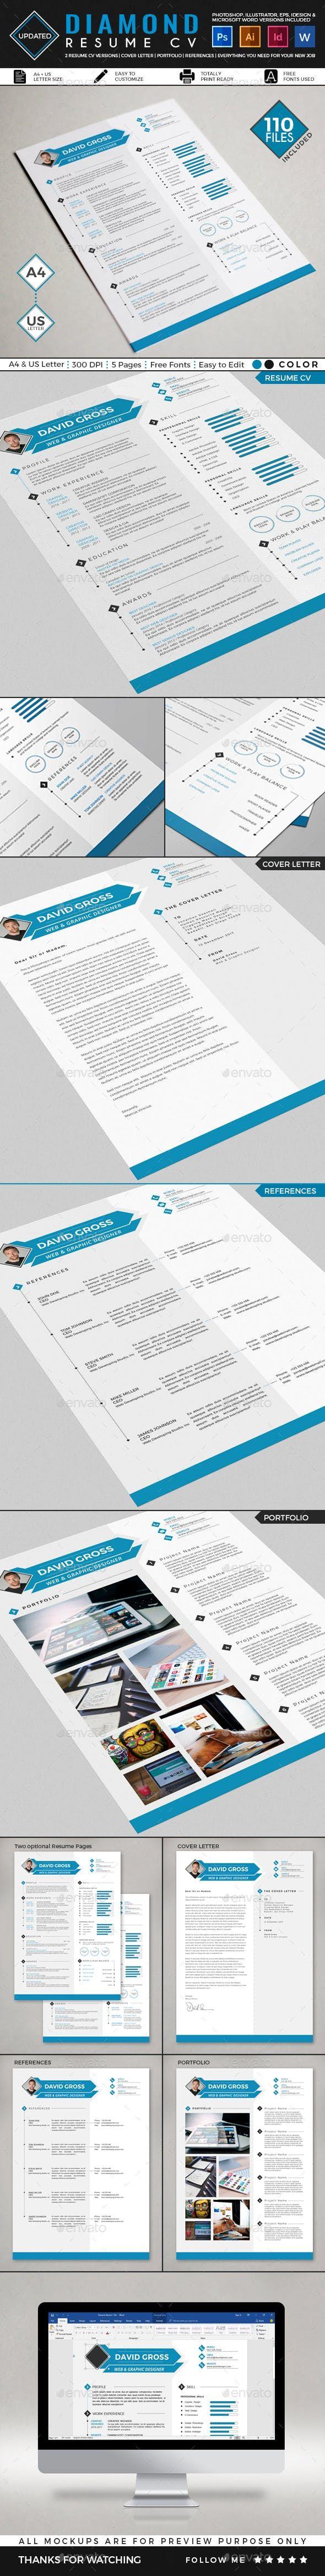 Diamond Resume CV Template Resume cv, Cv template, Resume